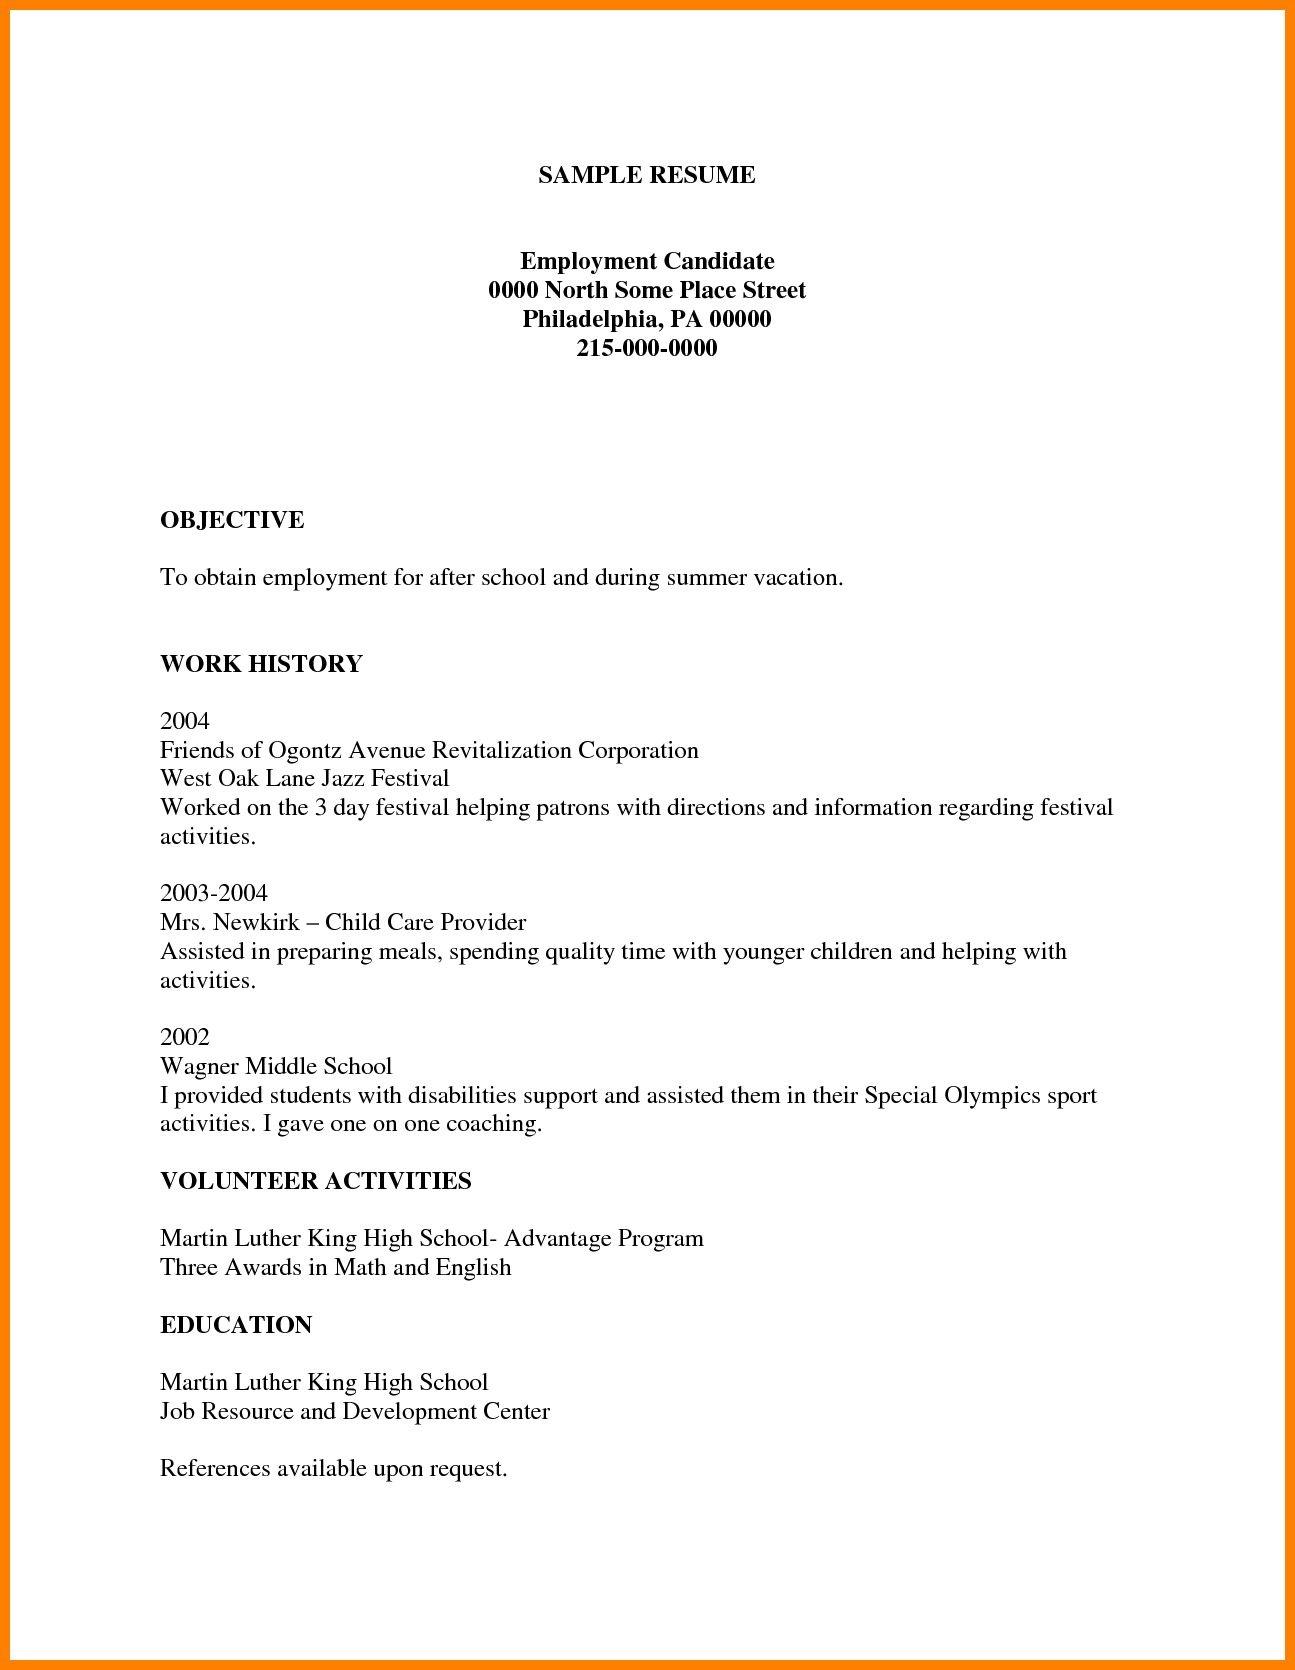 13 Free Resume Templates , #freeresumetemplates #resume #templates - Free Printable Resume Templates